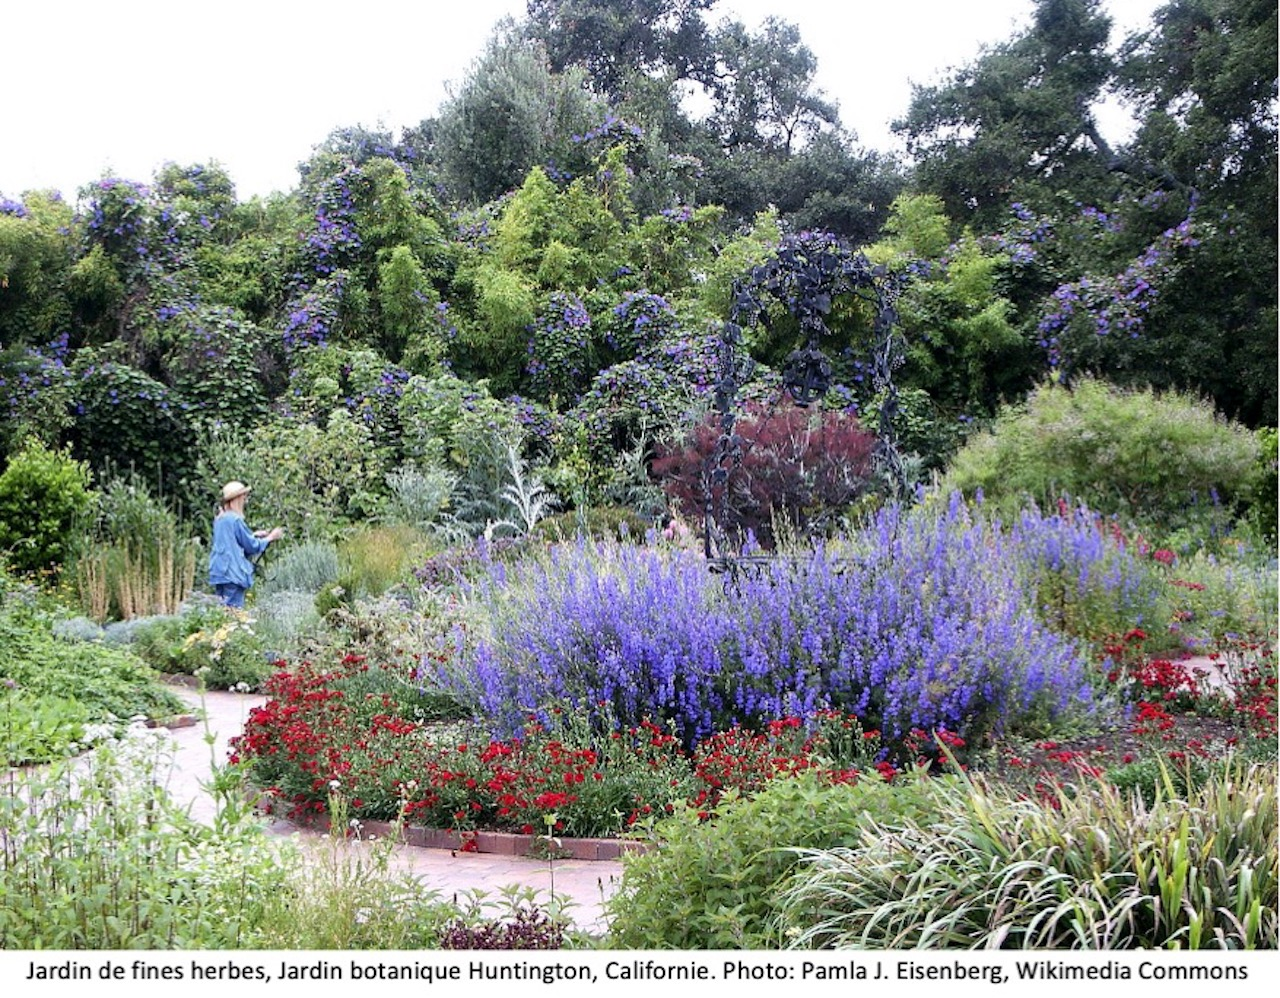 Jardin de fines herbes au Jardin botanique Huntington, San Marino, Californie